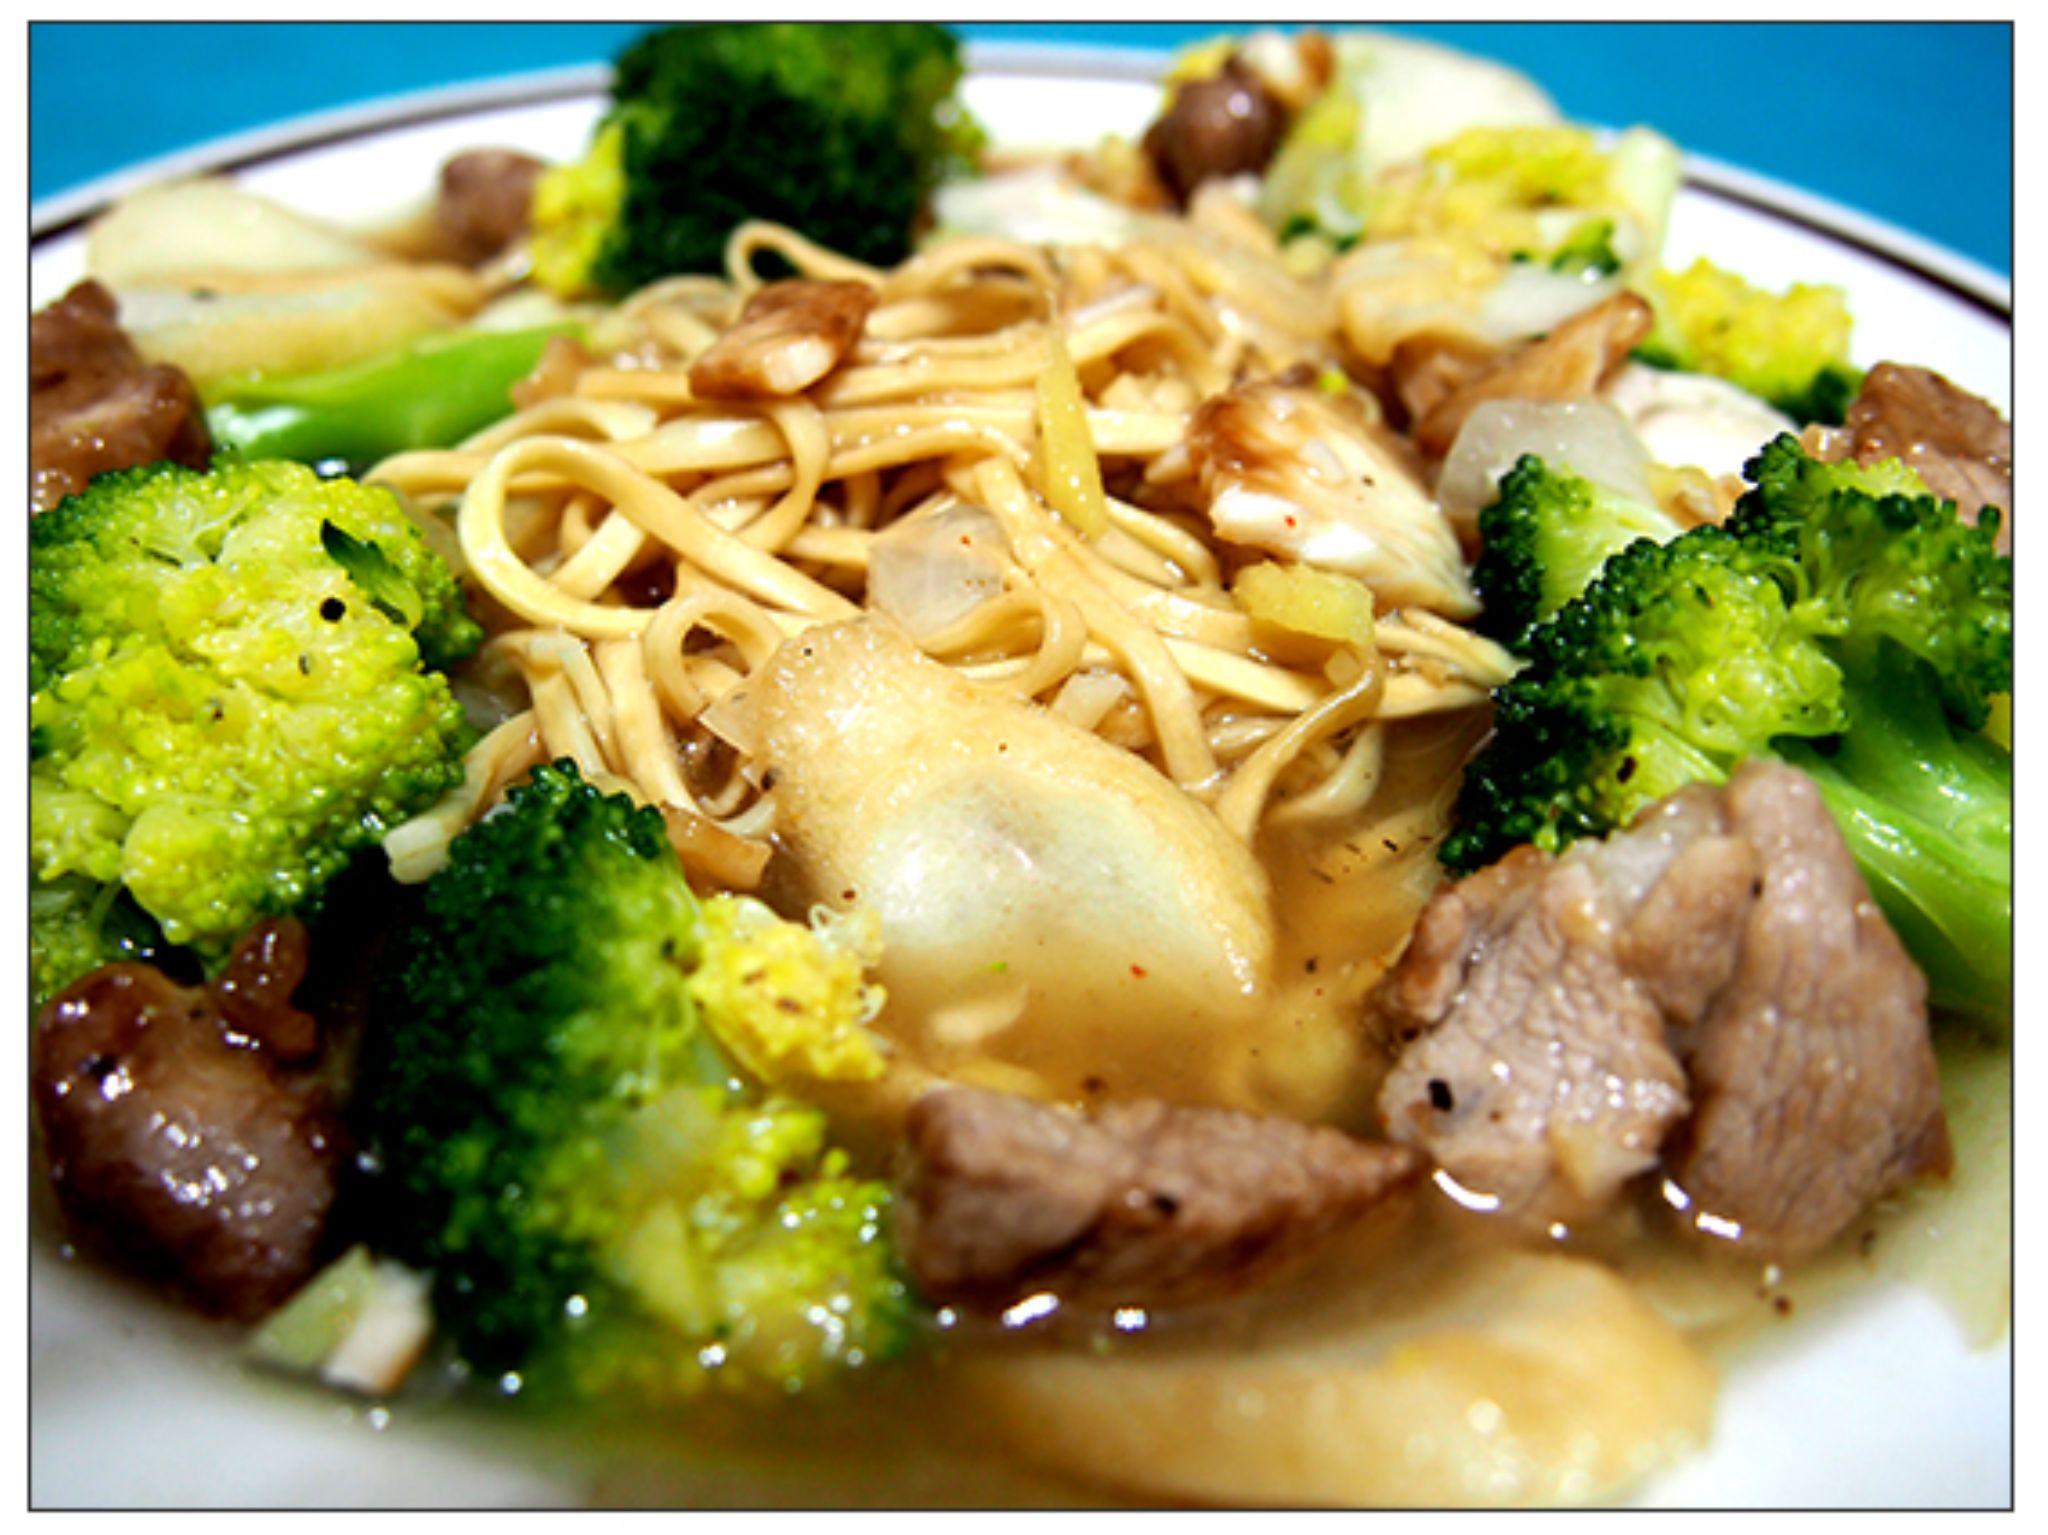 Chinese Cuisine by jessersim